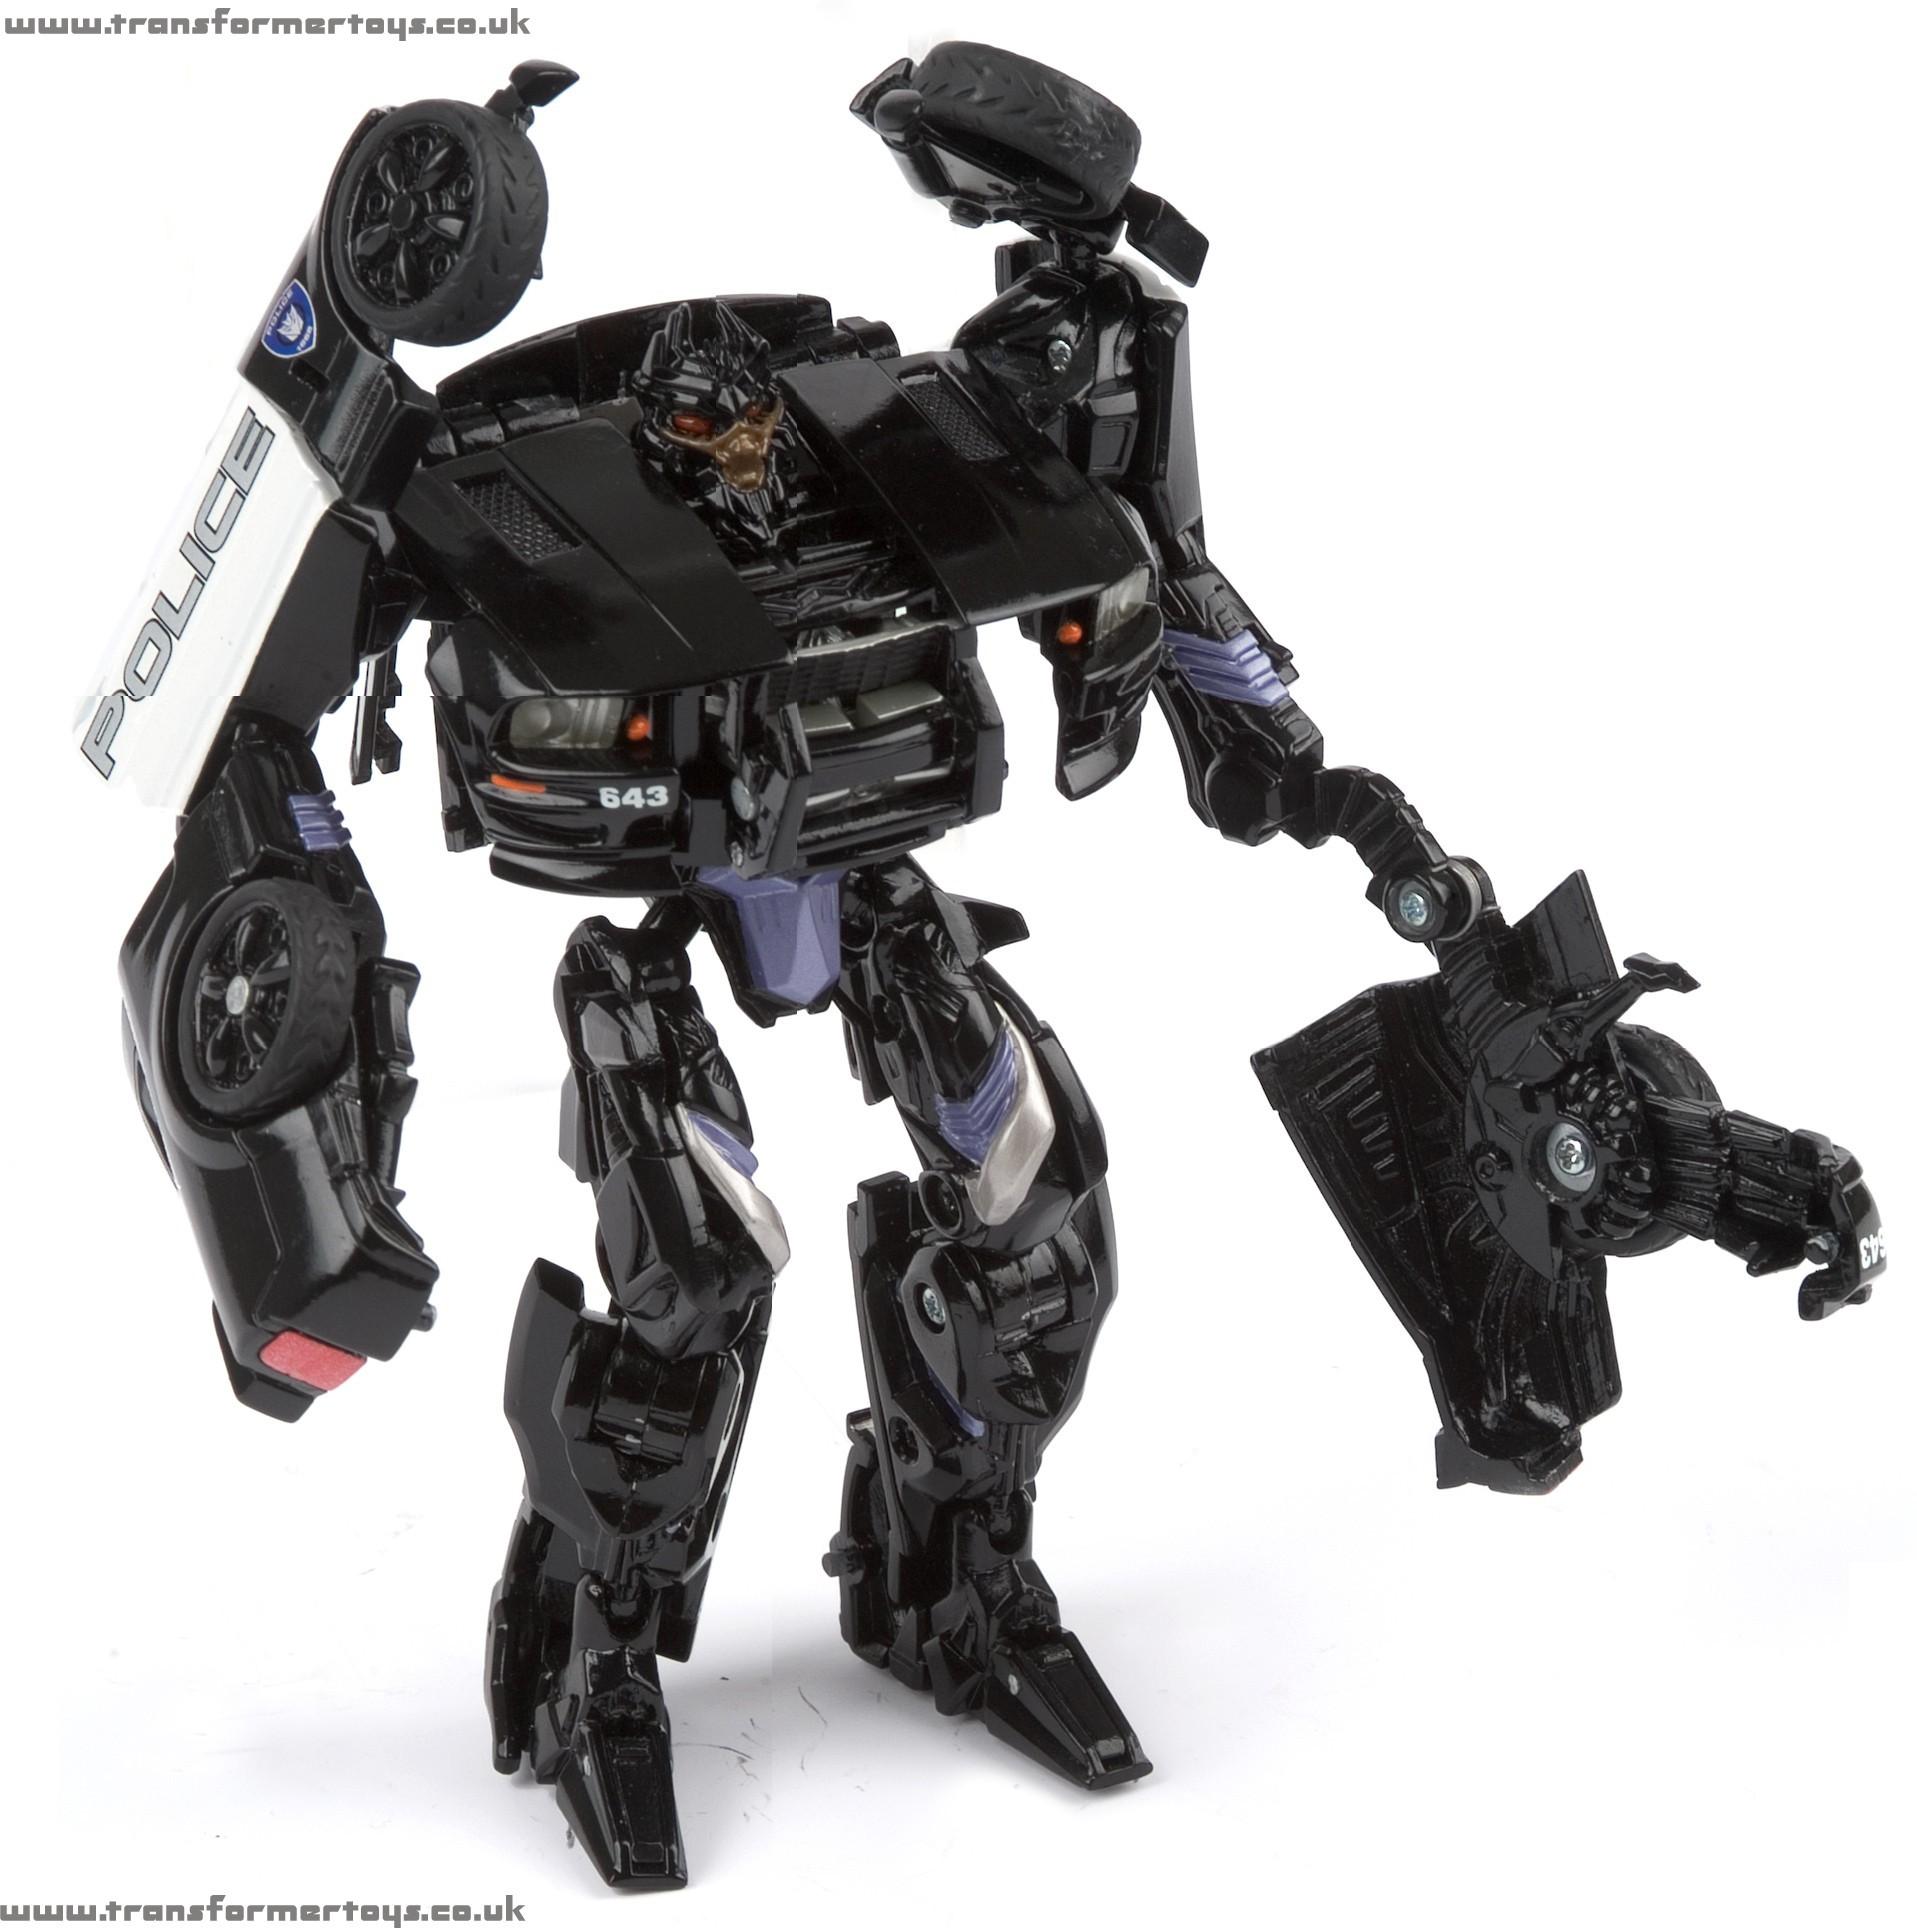 Barricade Transformer Toy Movie